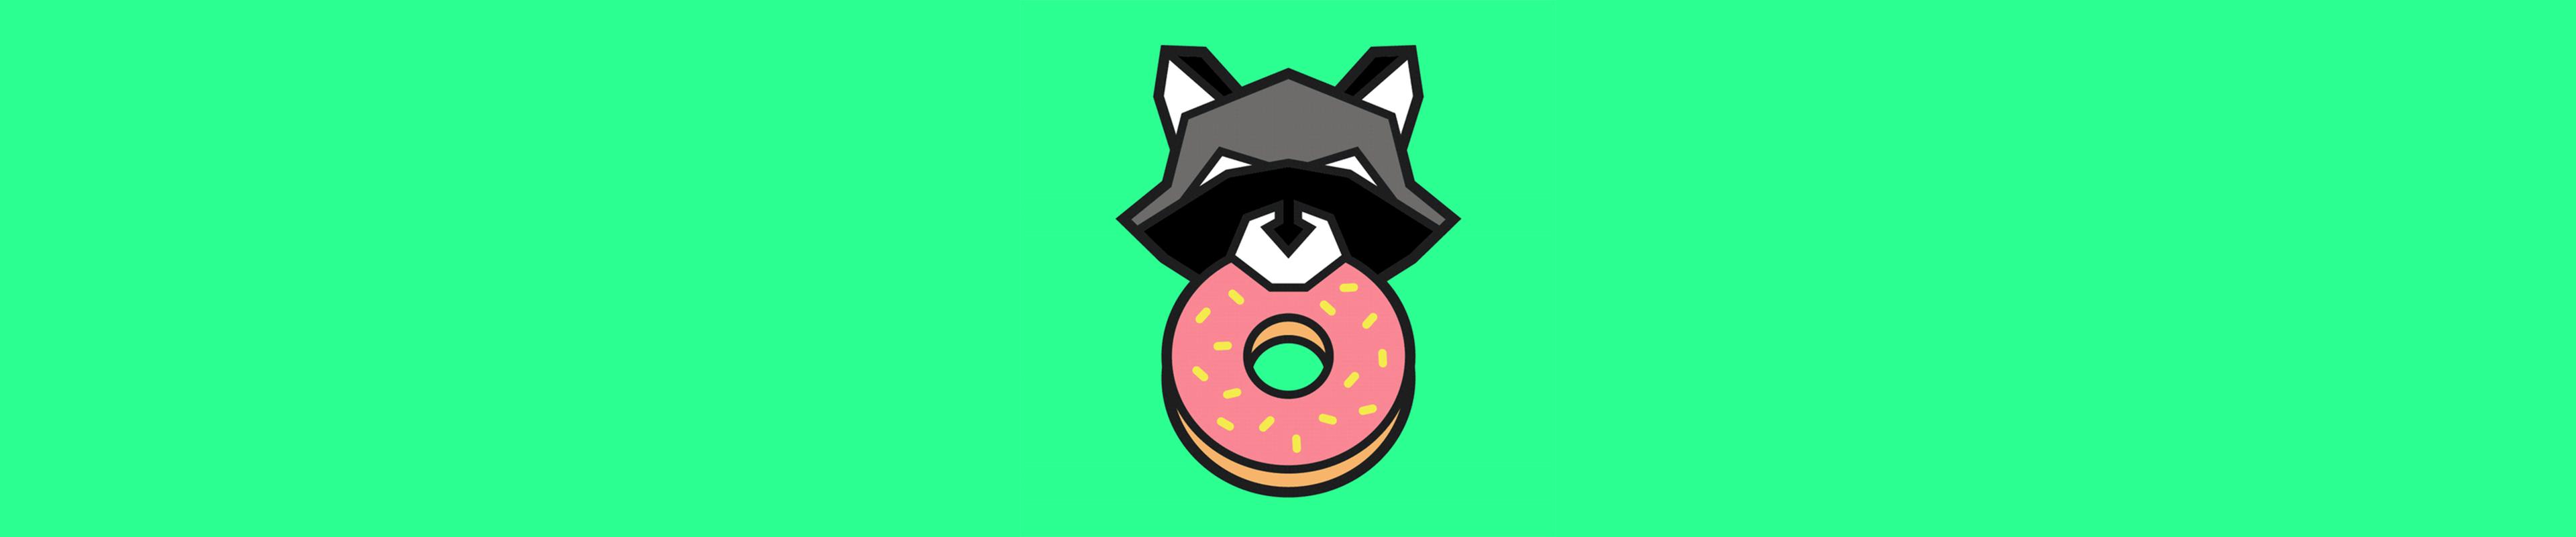 [已购]Donut County-草蜢资源